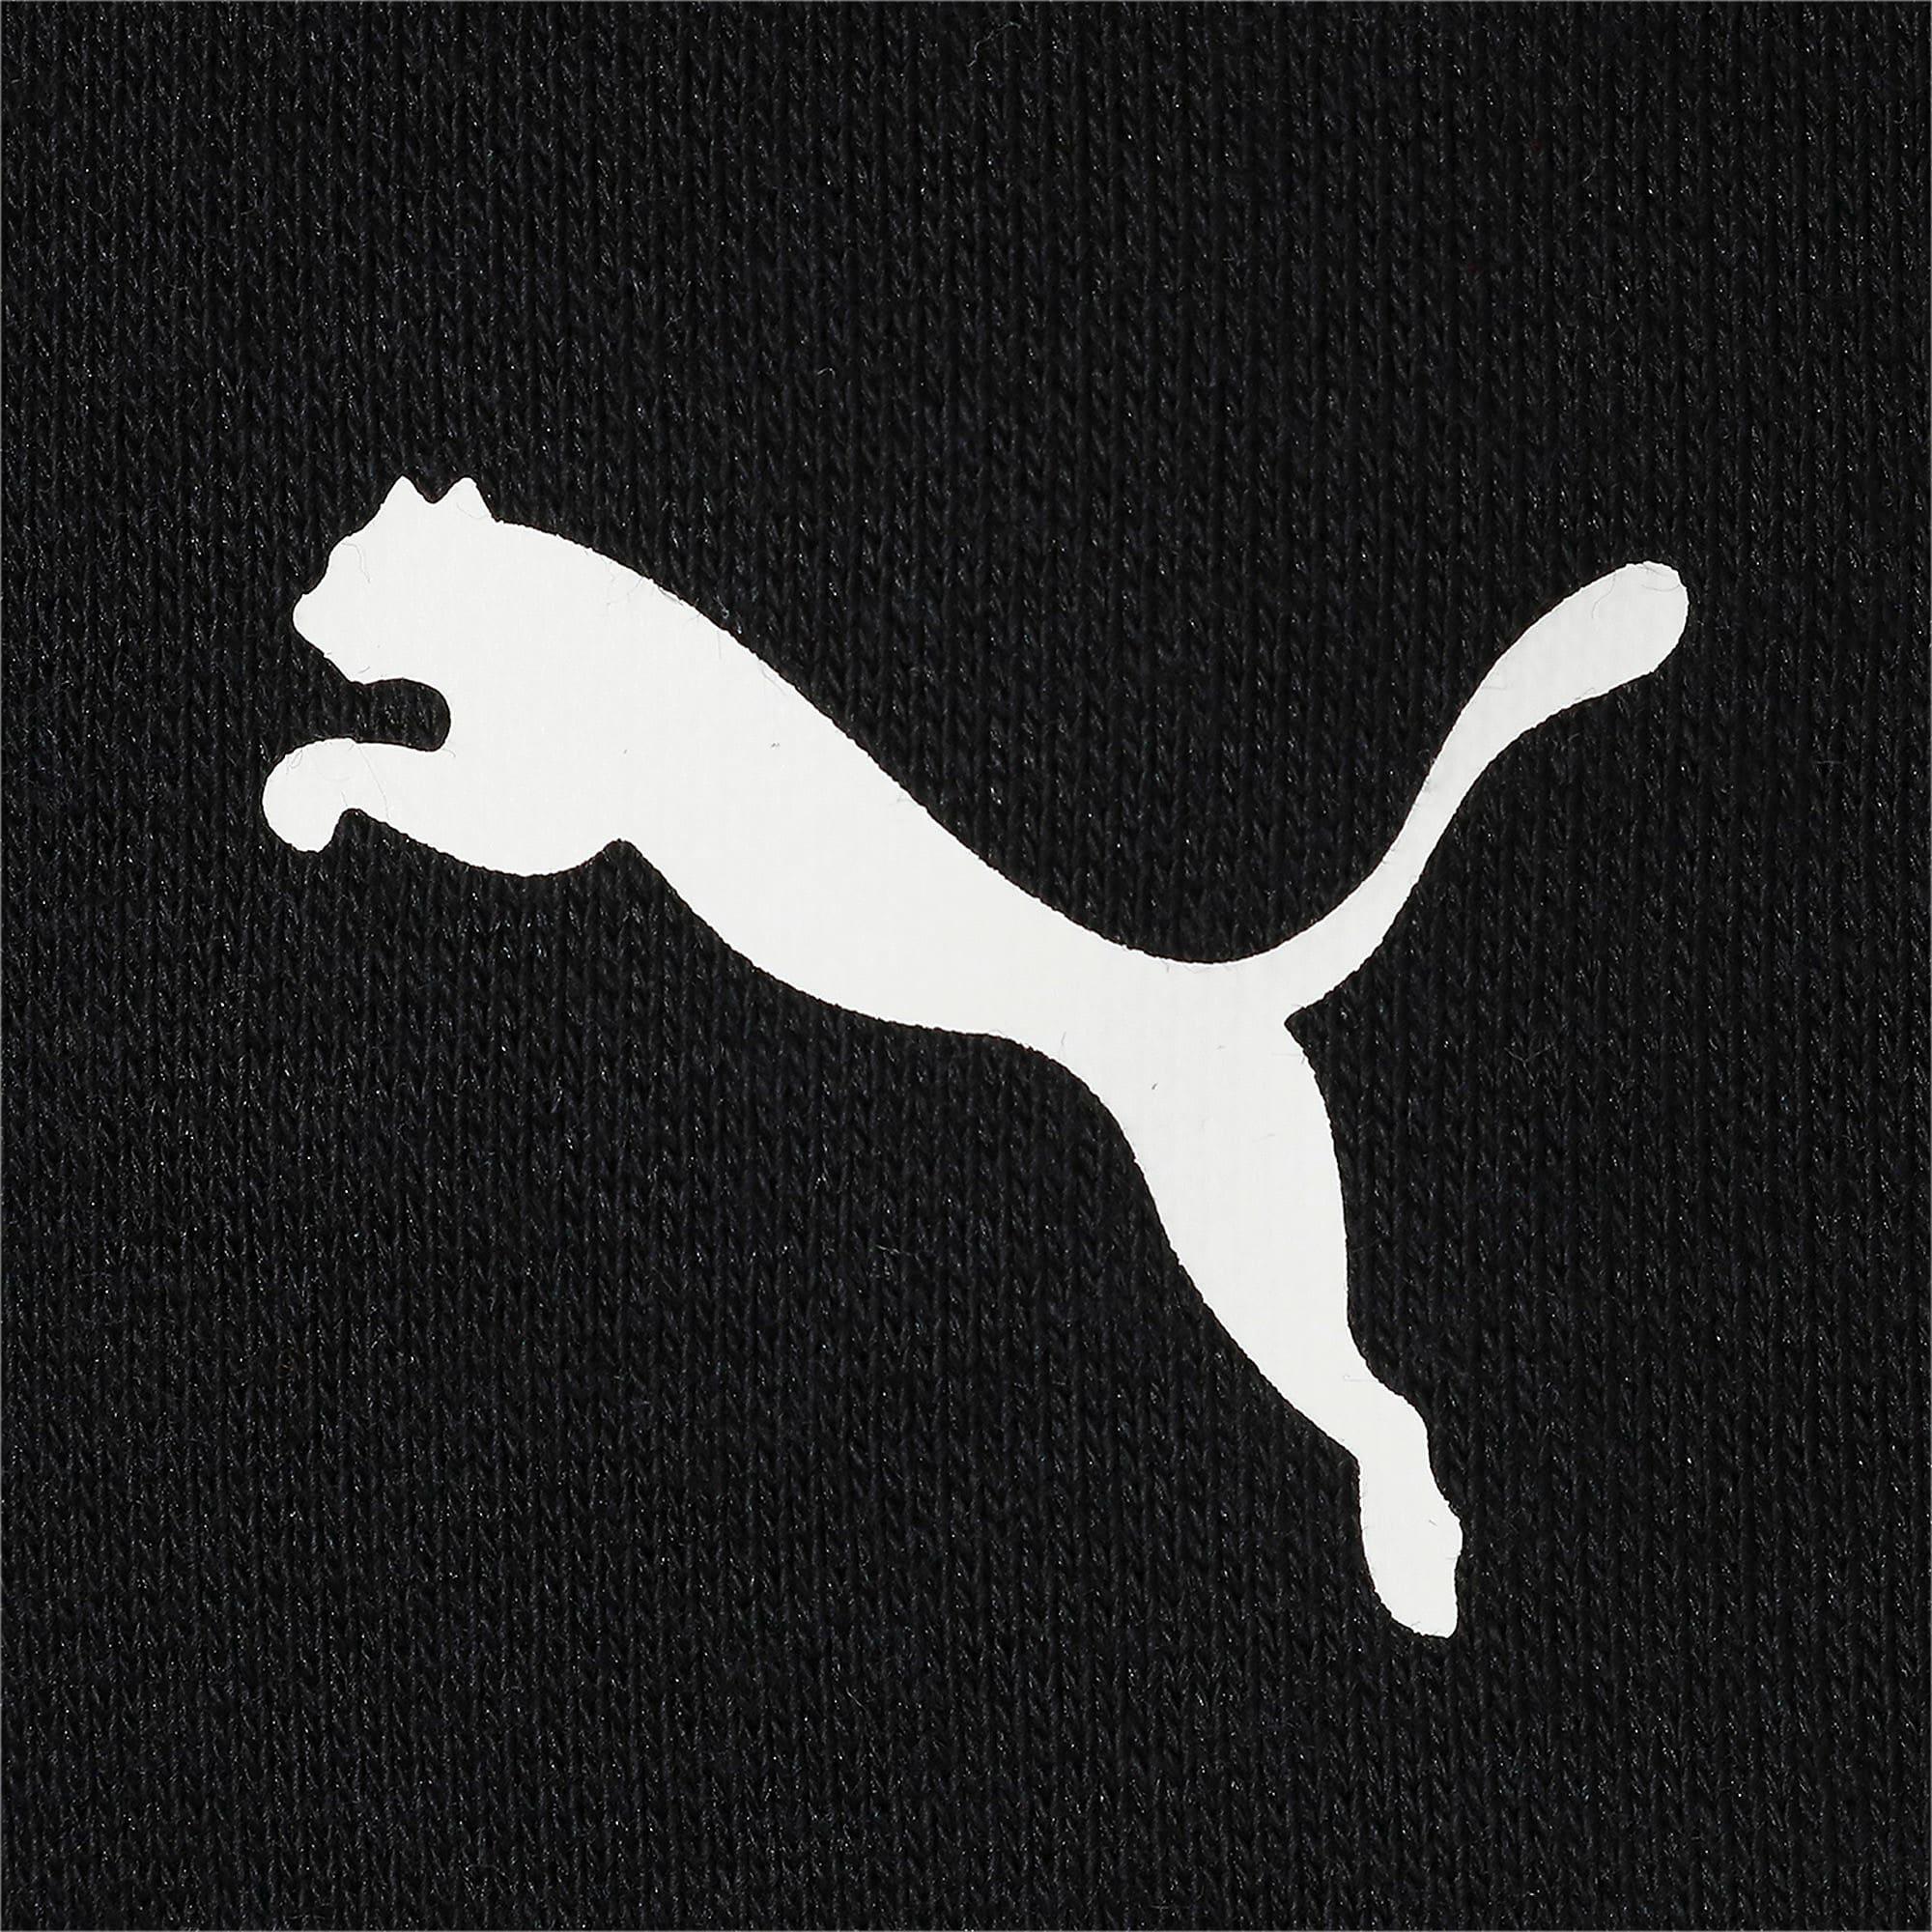 Thumbnail 4 of キッズ アルファ グラフィック フルジップ FL, Puma Black, medium-JPN